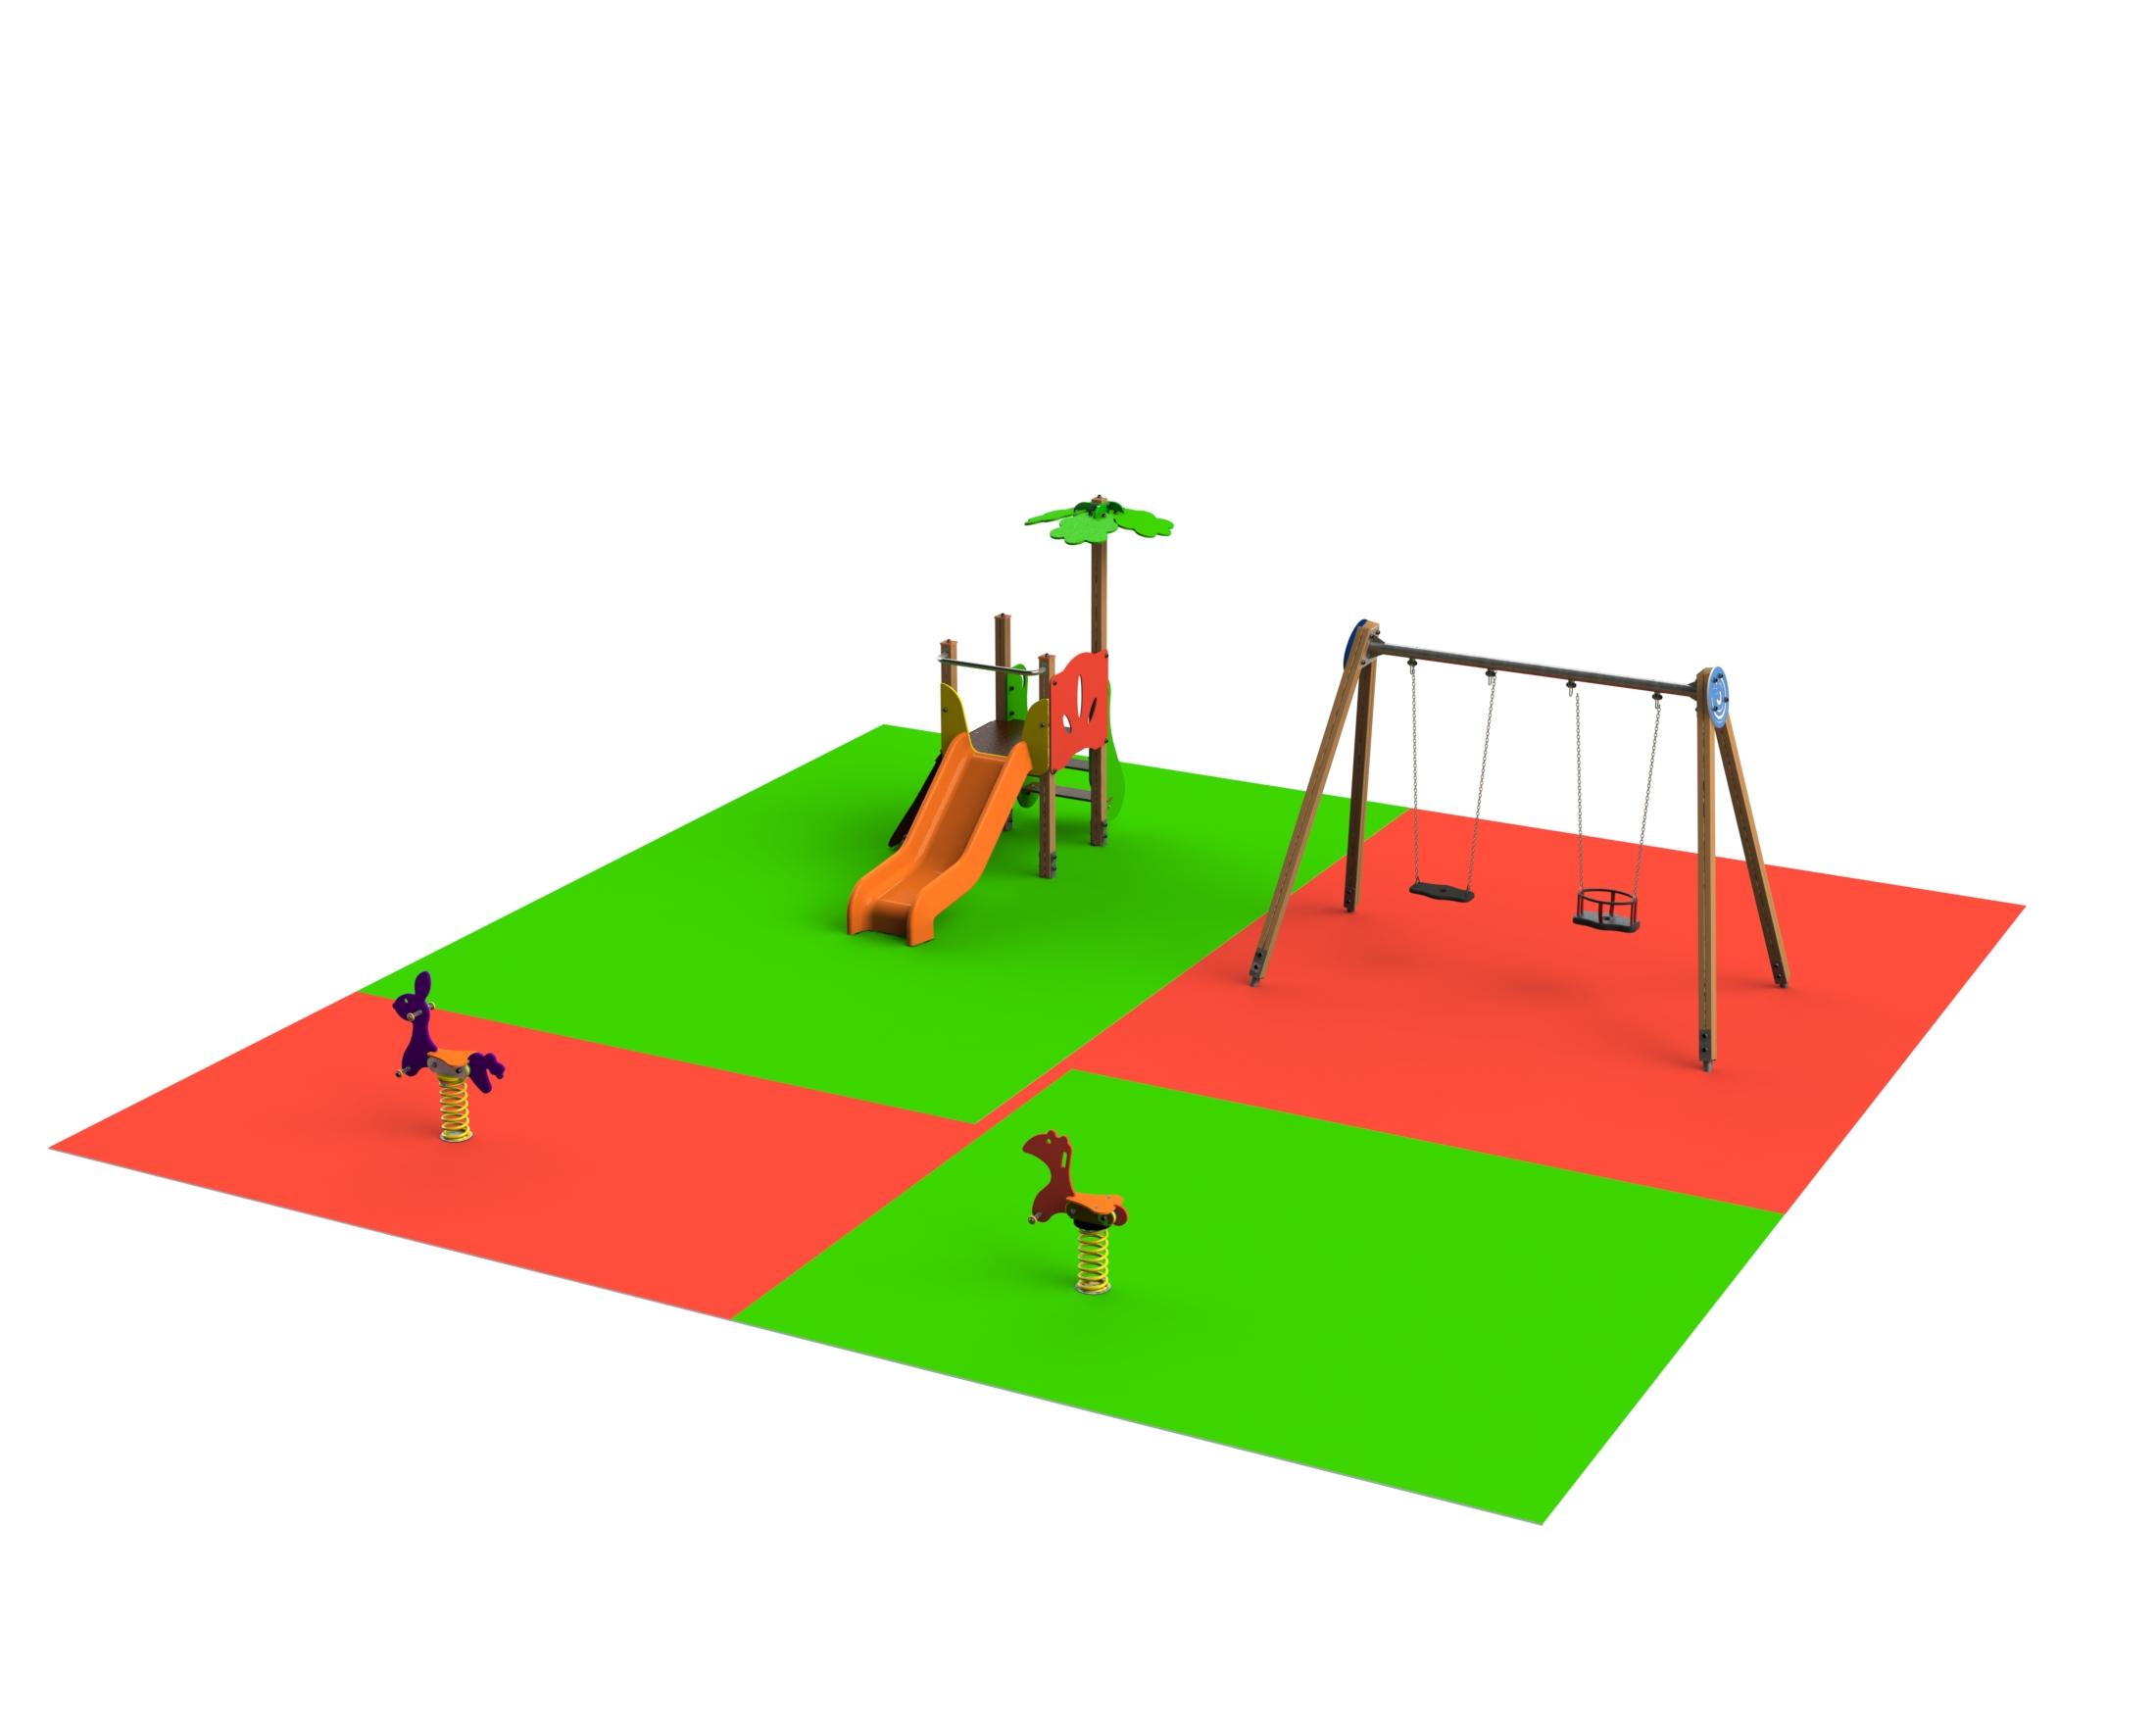 Ofertas para parques infantiles en patios de colegios de infantil